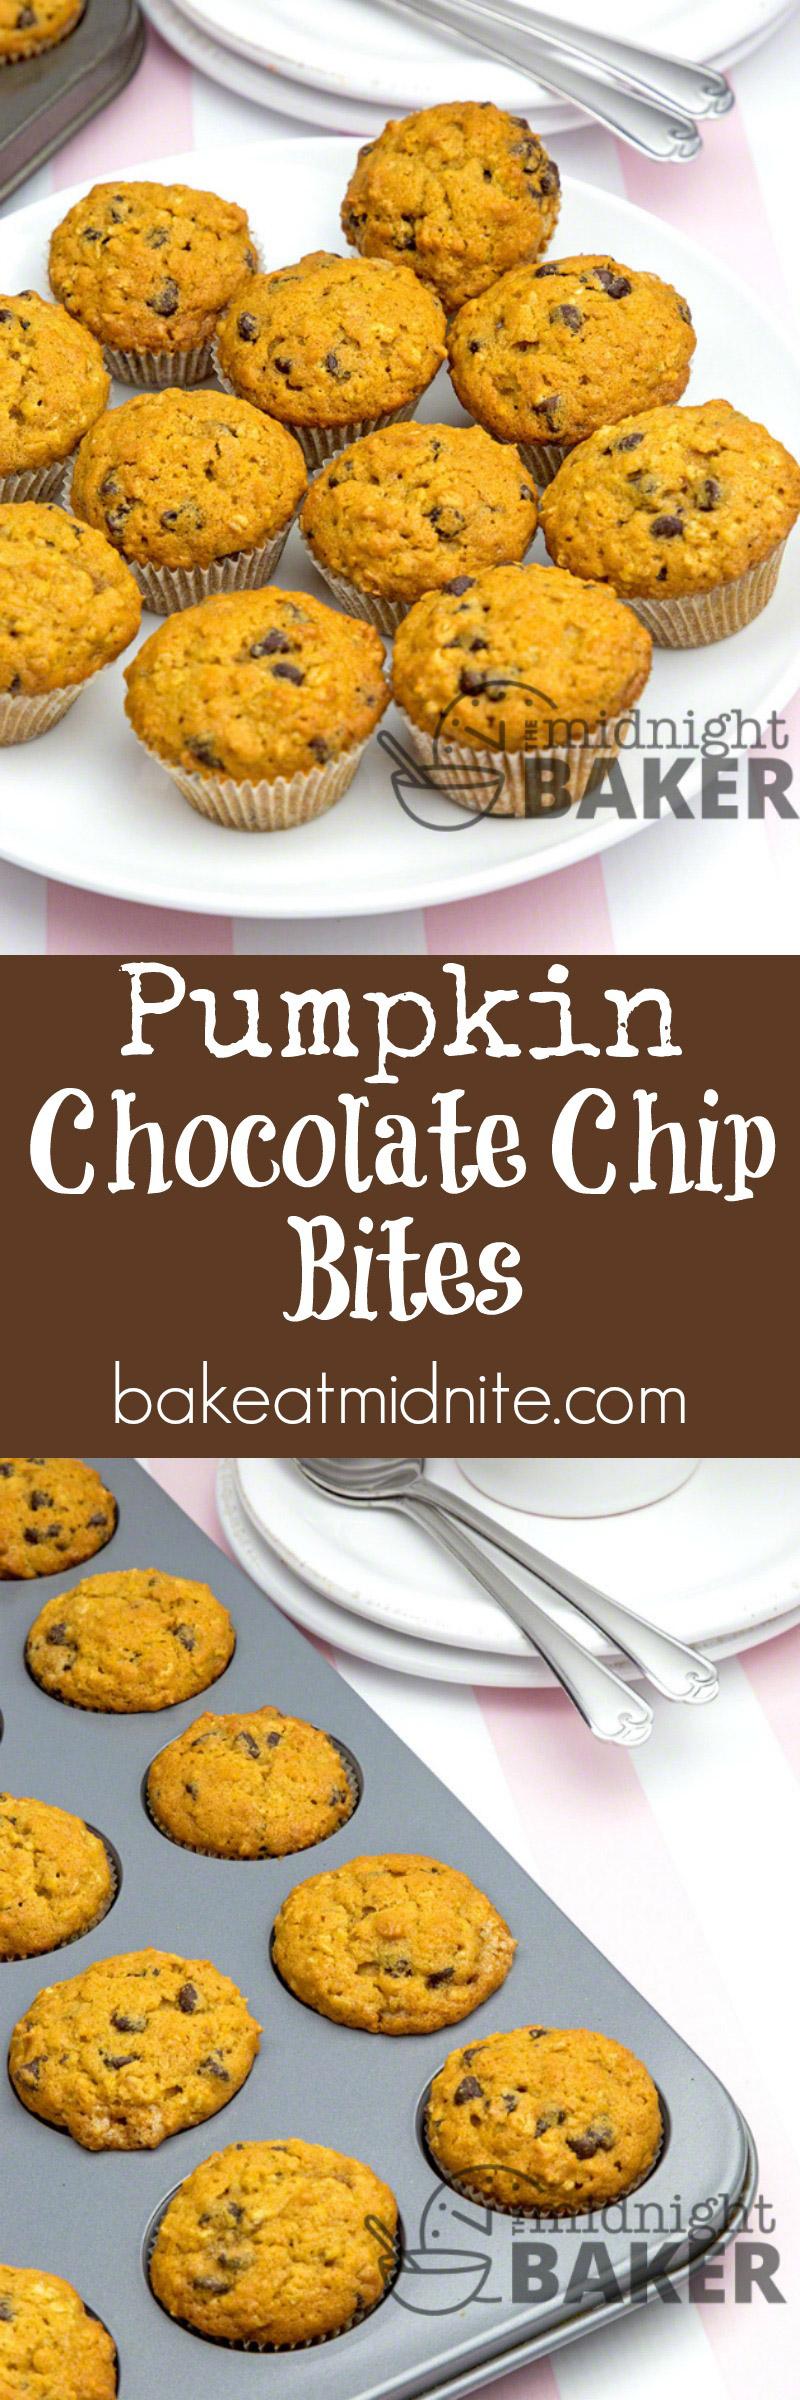 pumpkin-chocolate-chip-bites-lg-pin